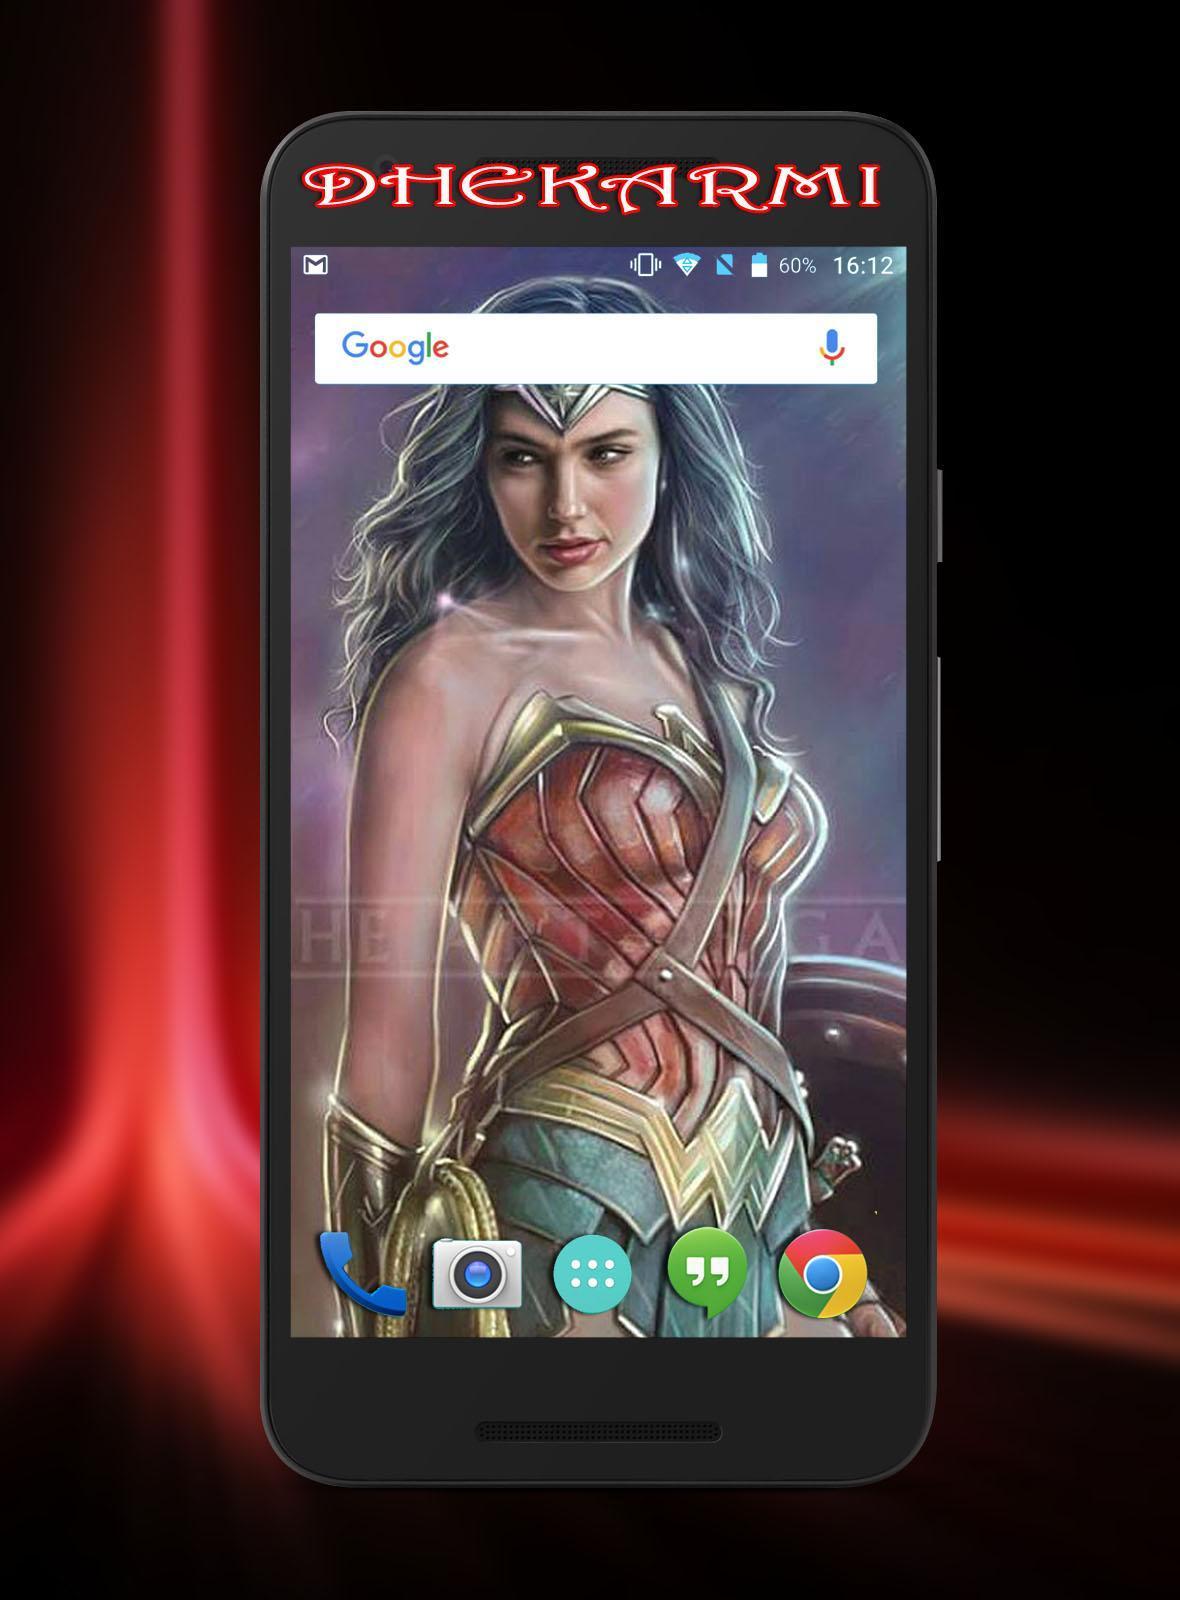 Gal Gadot Wonder Woman Wallpaper Hd For Android Apk Download